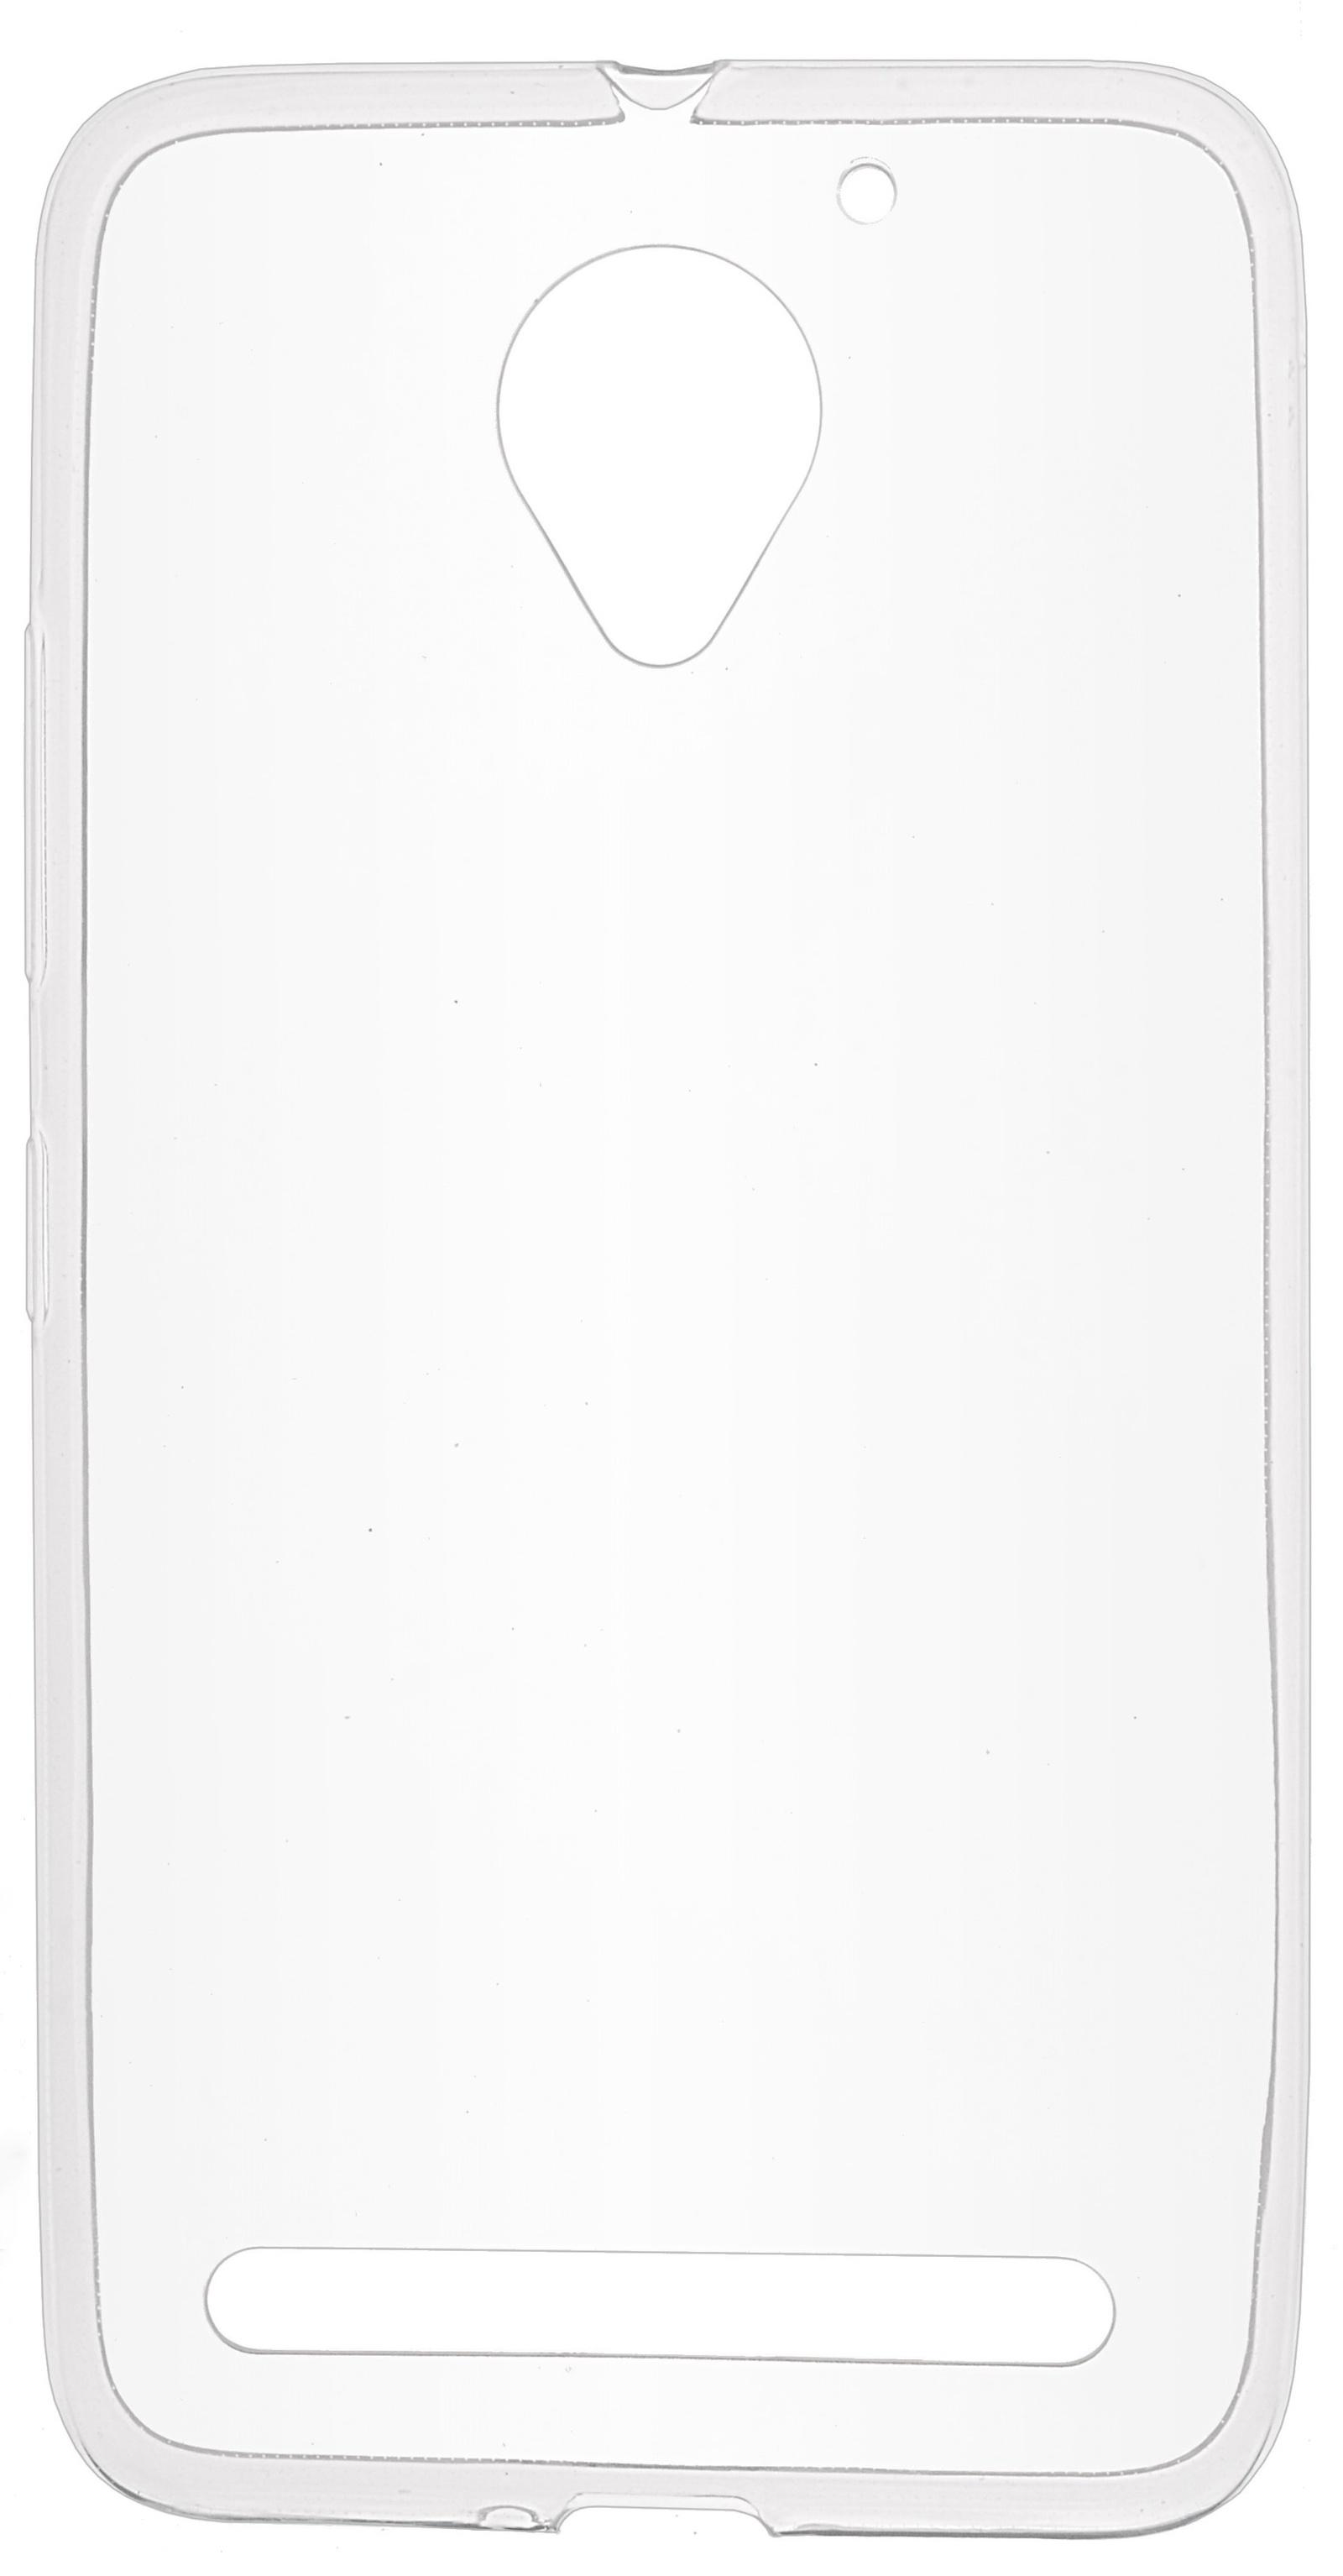 Чехол для сотового телефона skinBOX Slim Silicone, 4630042528192, прозрачный чехол для xiaomi redmi pro skinbox 4people slim silicone case прозрачный